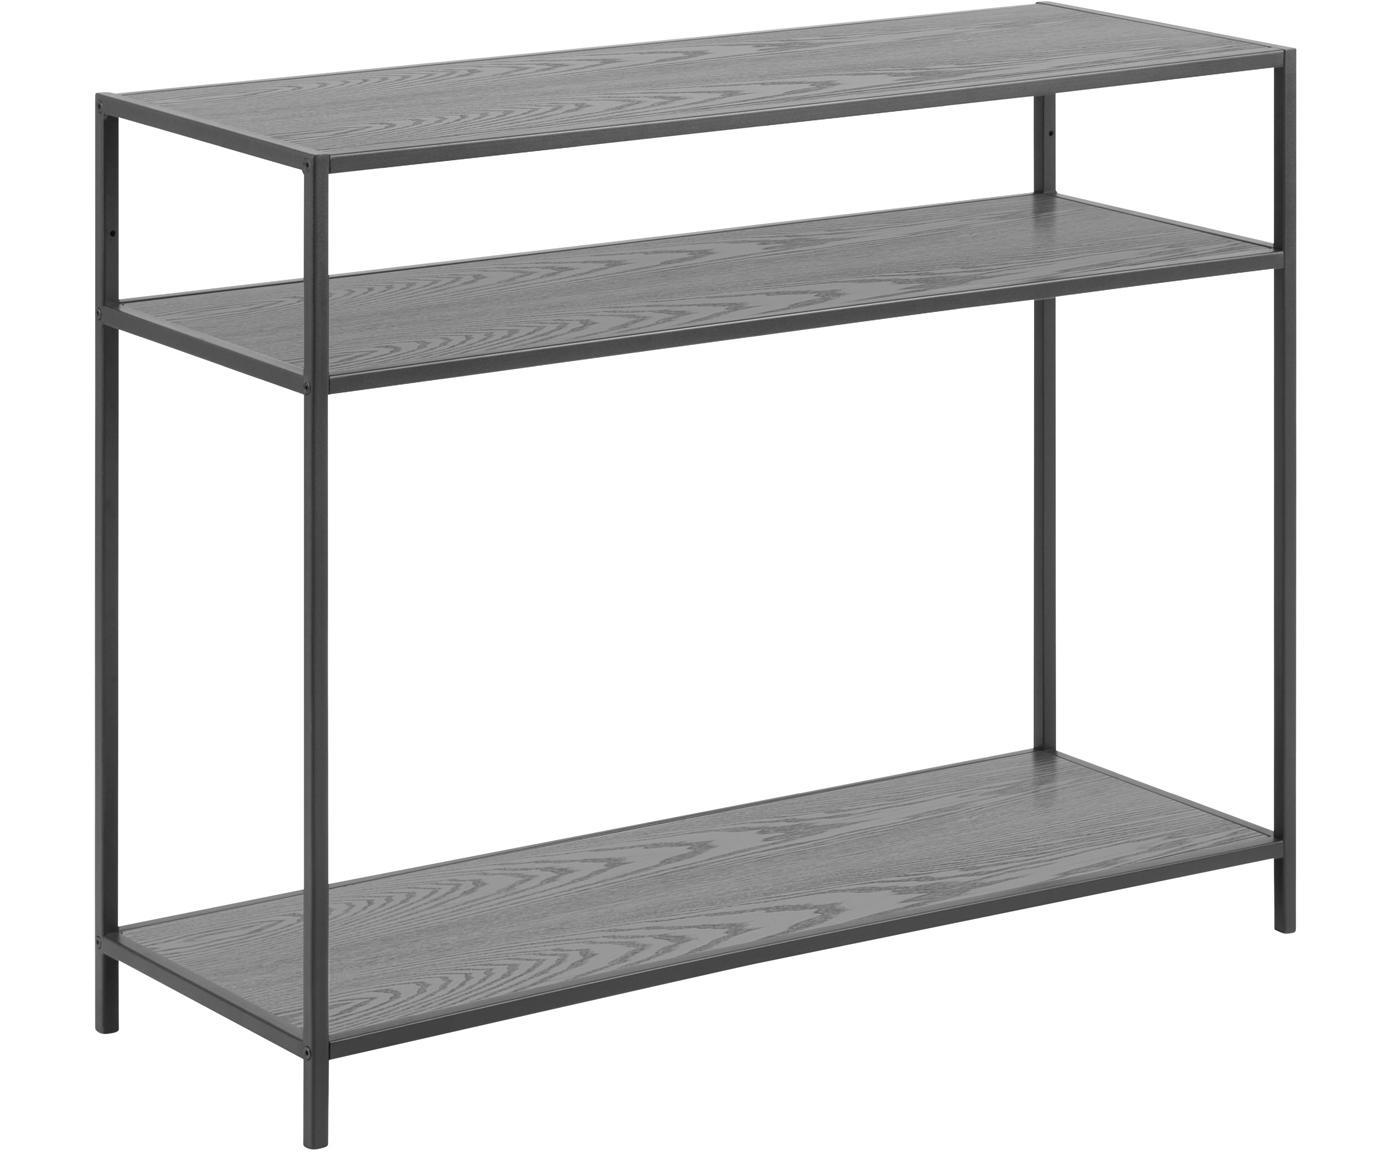 Consola Seaford, Estantes: tablero de fibras de dens, Estructura: metal con pintura en polv, Negro, An 100 x F 35 cm